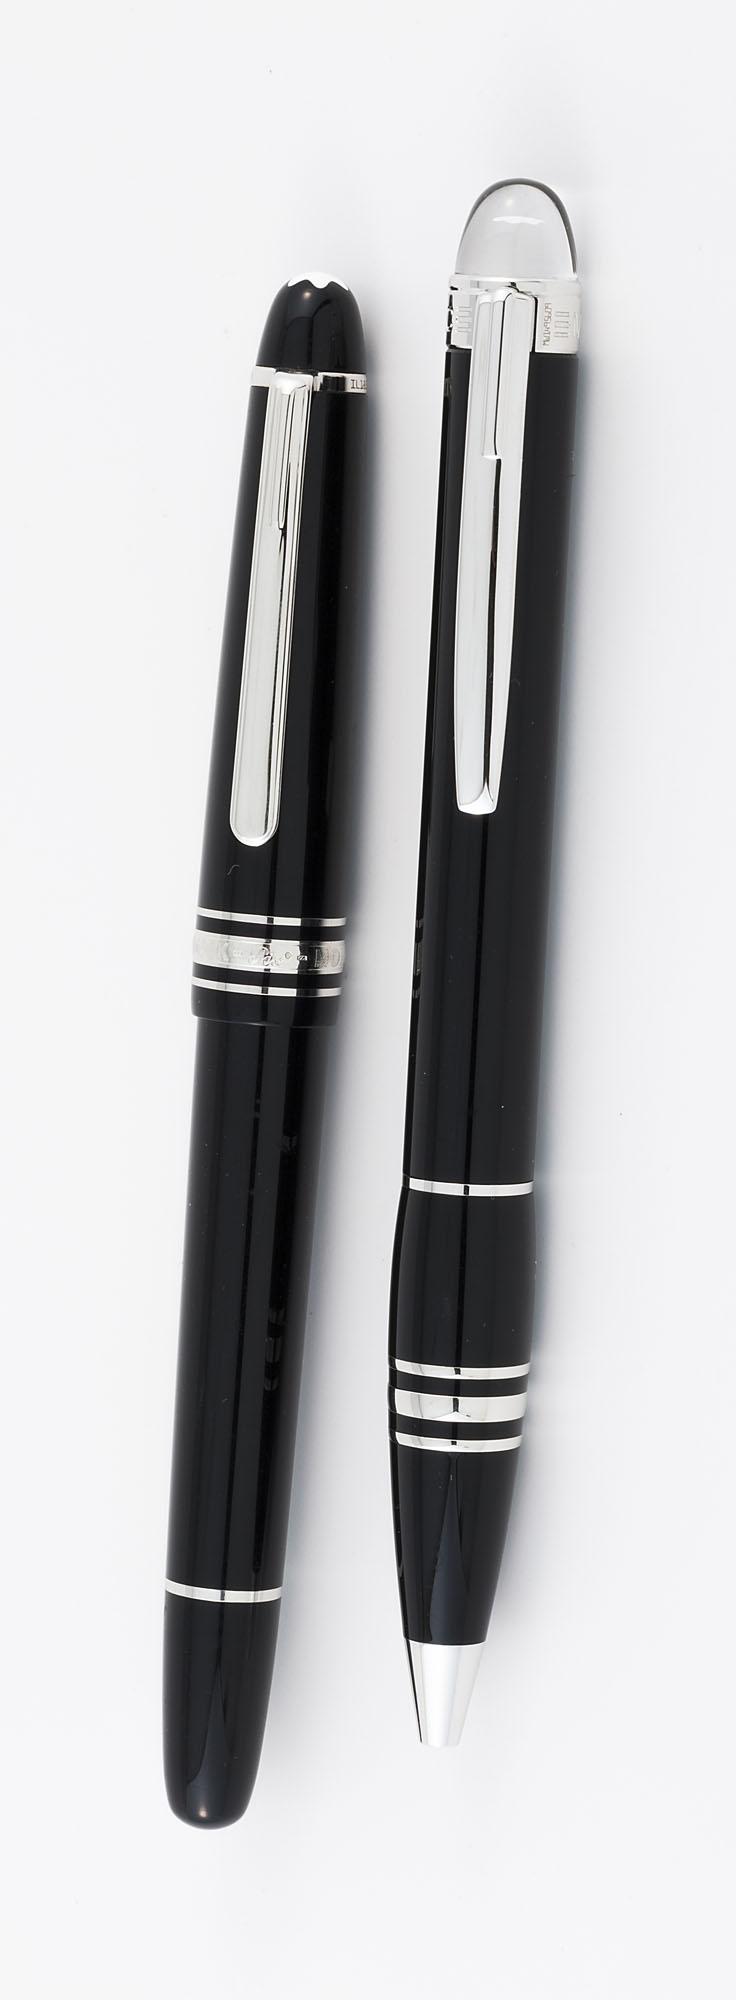 mont blanc starwalker et meisterst 252 ck paire de stylos bill